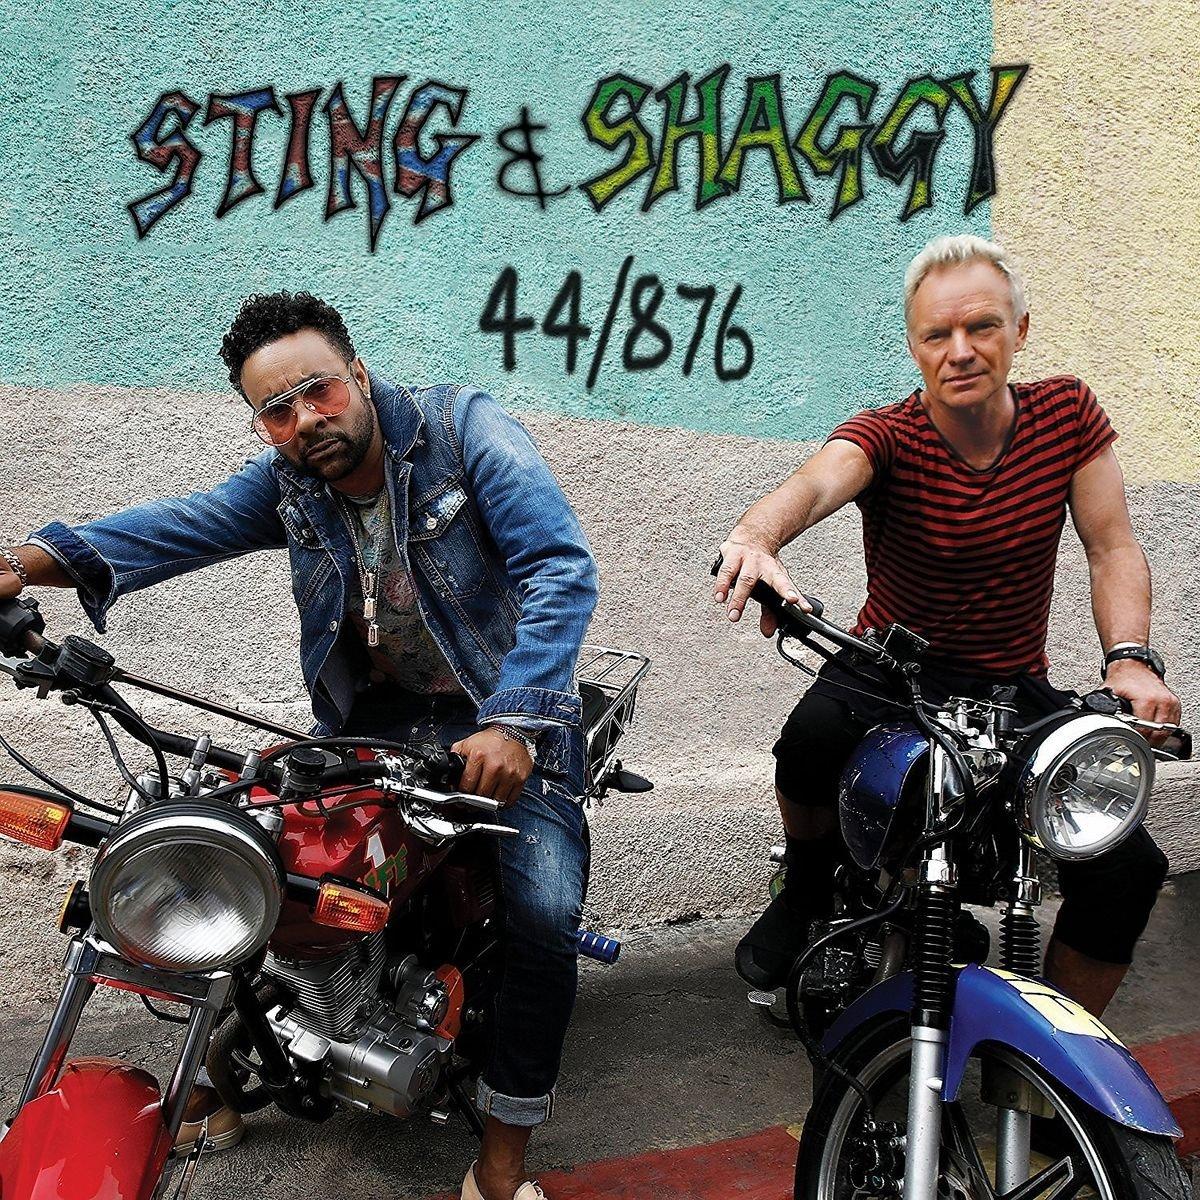 Vinilo : STING/SHAGGY - 44/ 876 (180 Gram Vinyl)